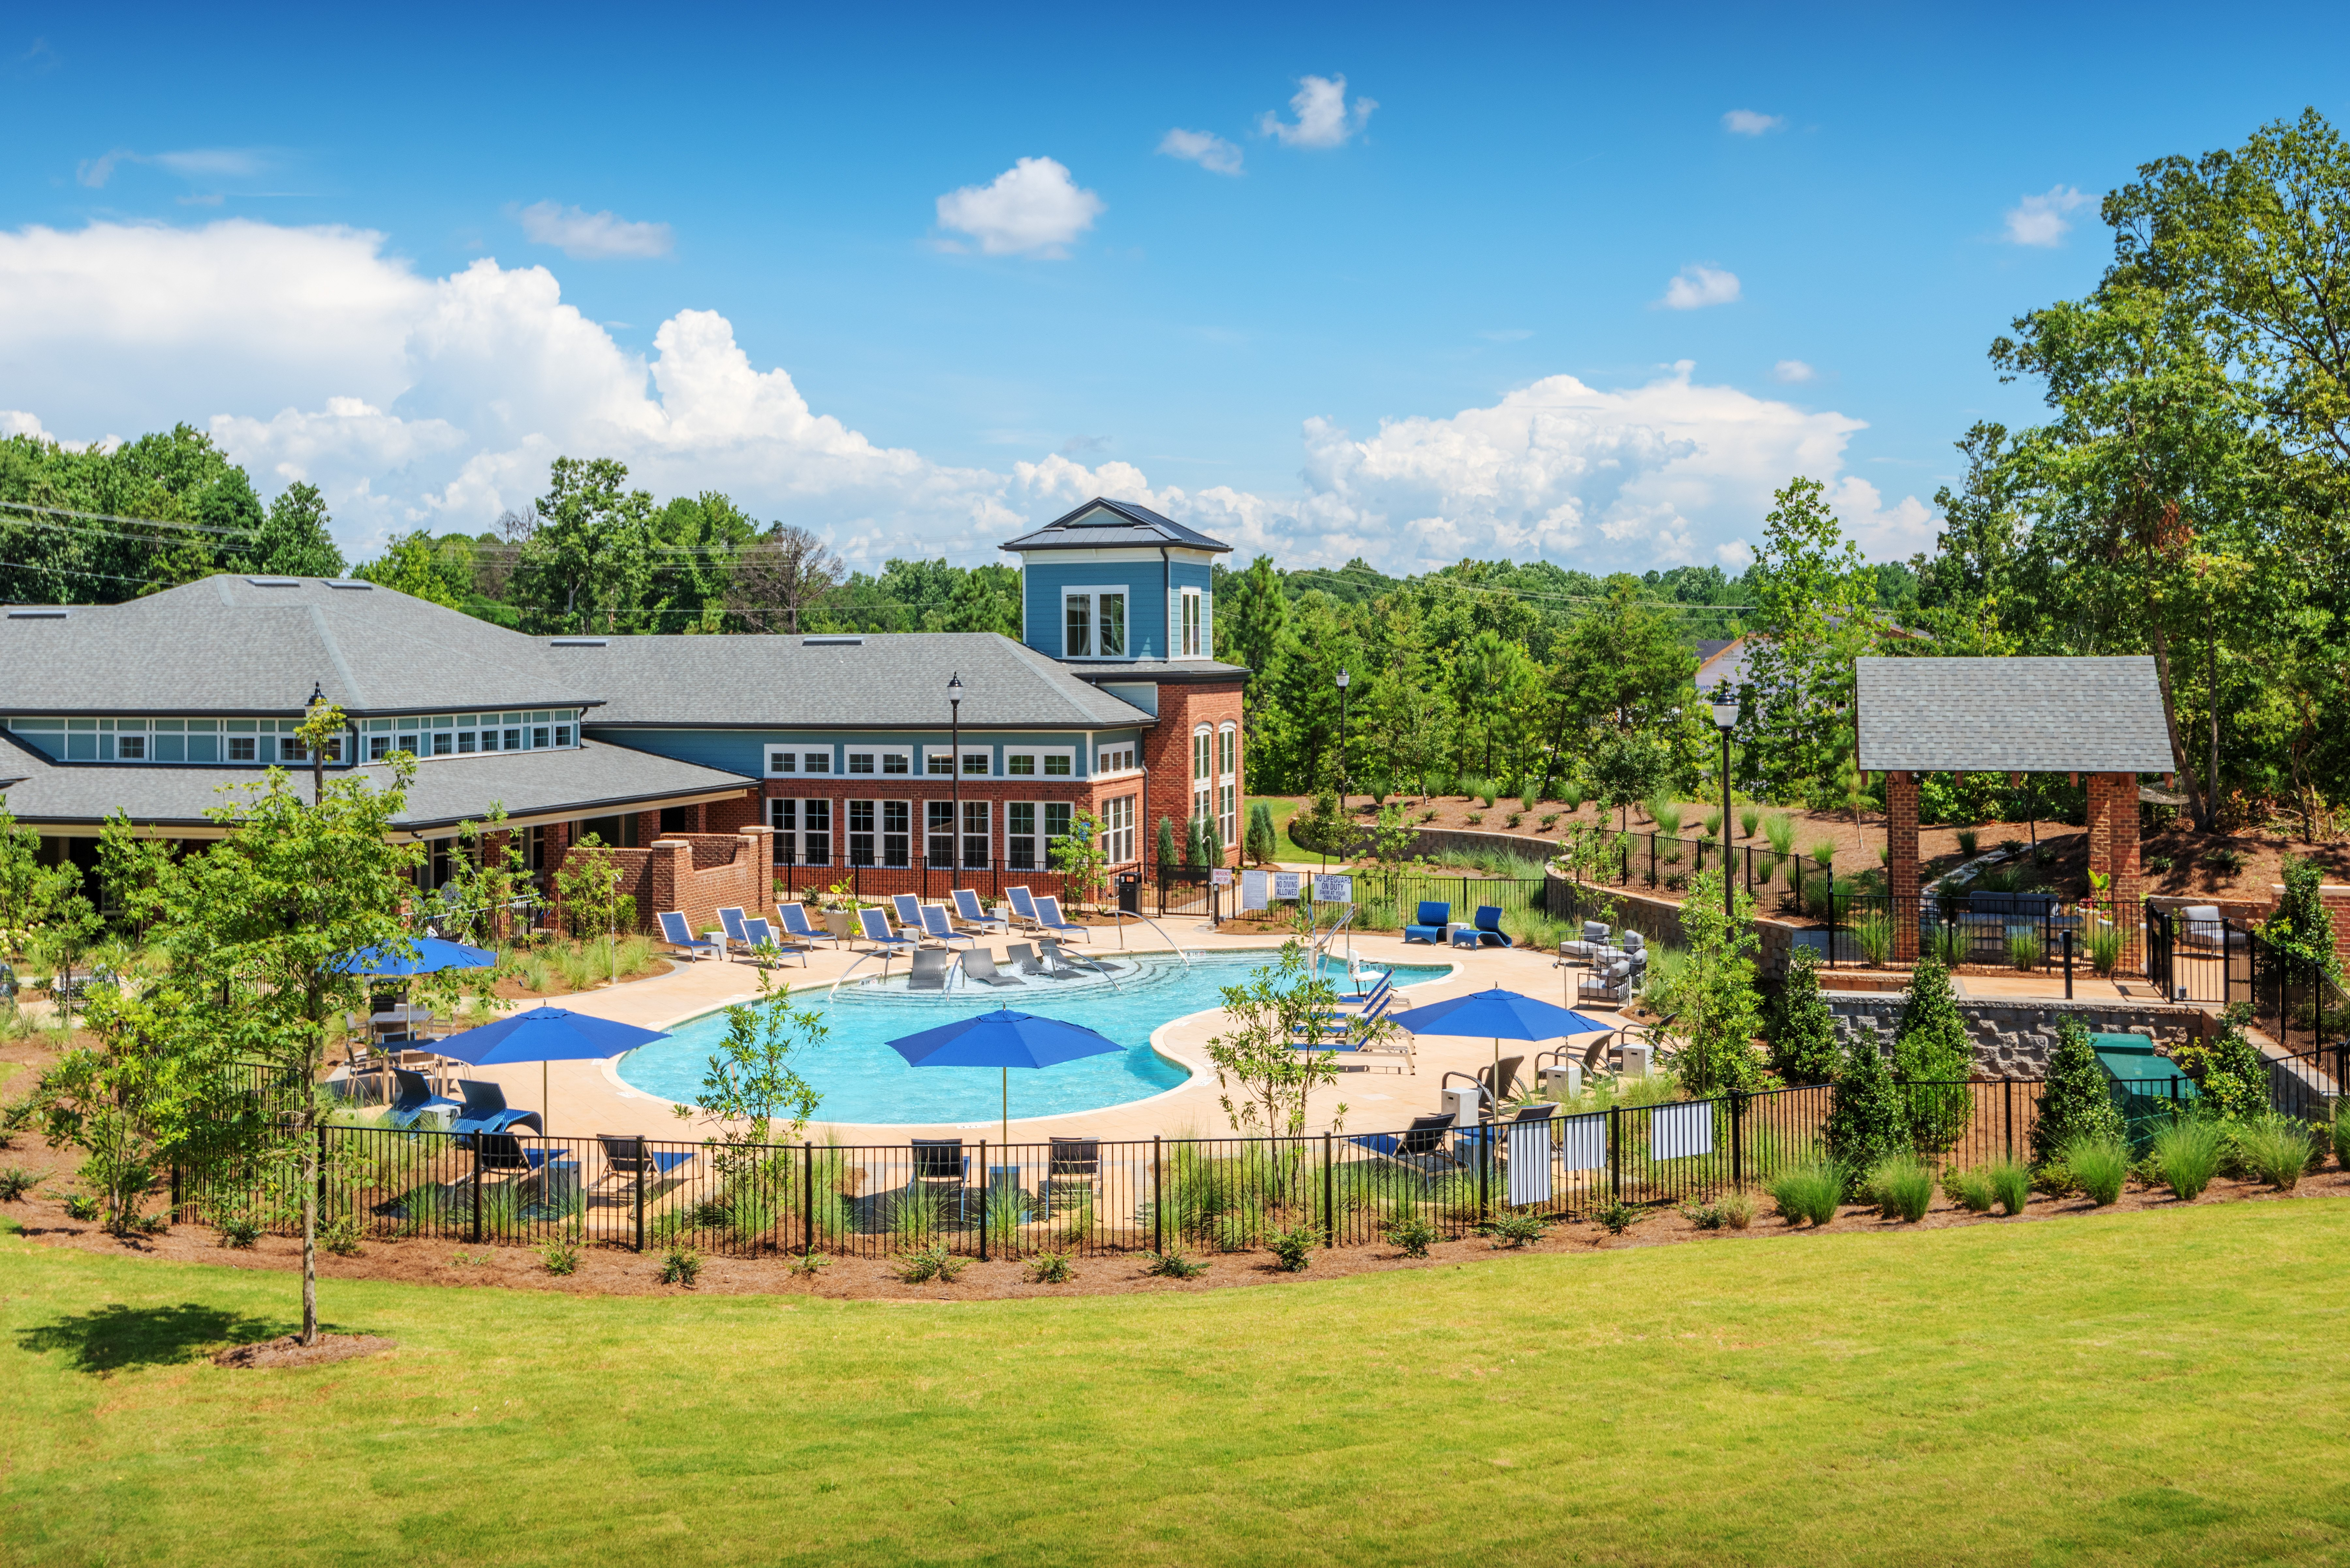 Apartments Near South Carolina Trailside Verdae Apartments for South Carolina Students in , SC